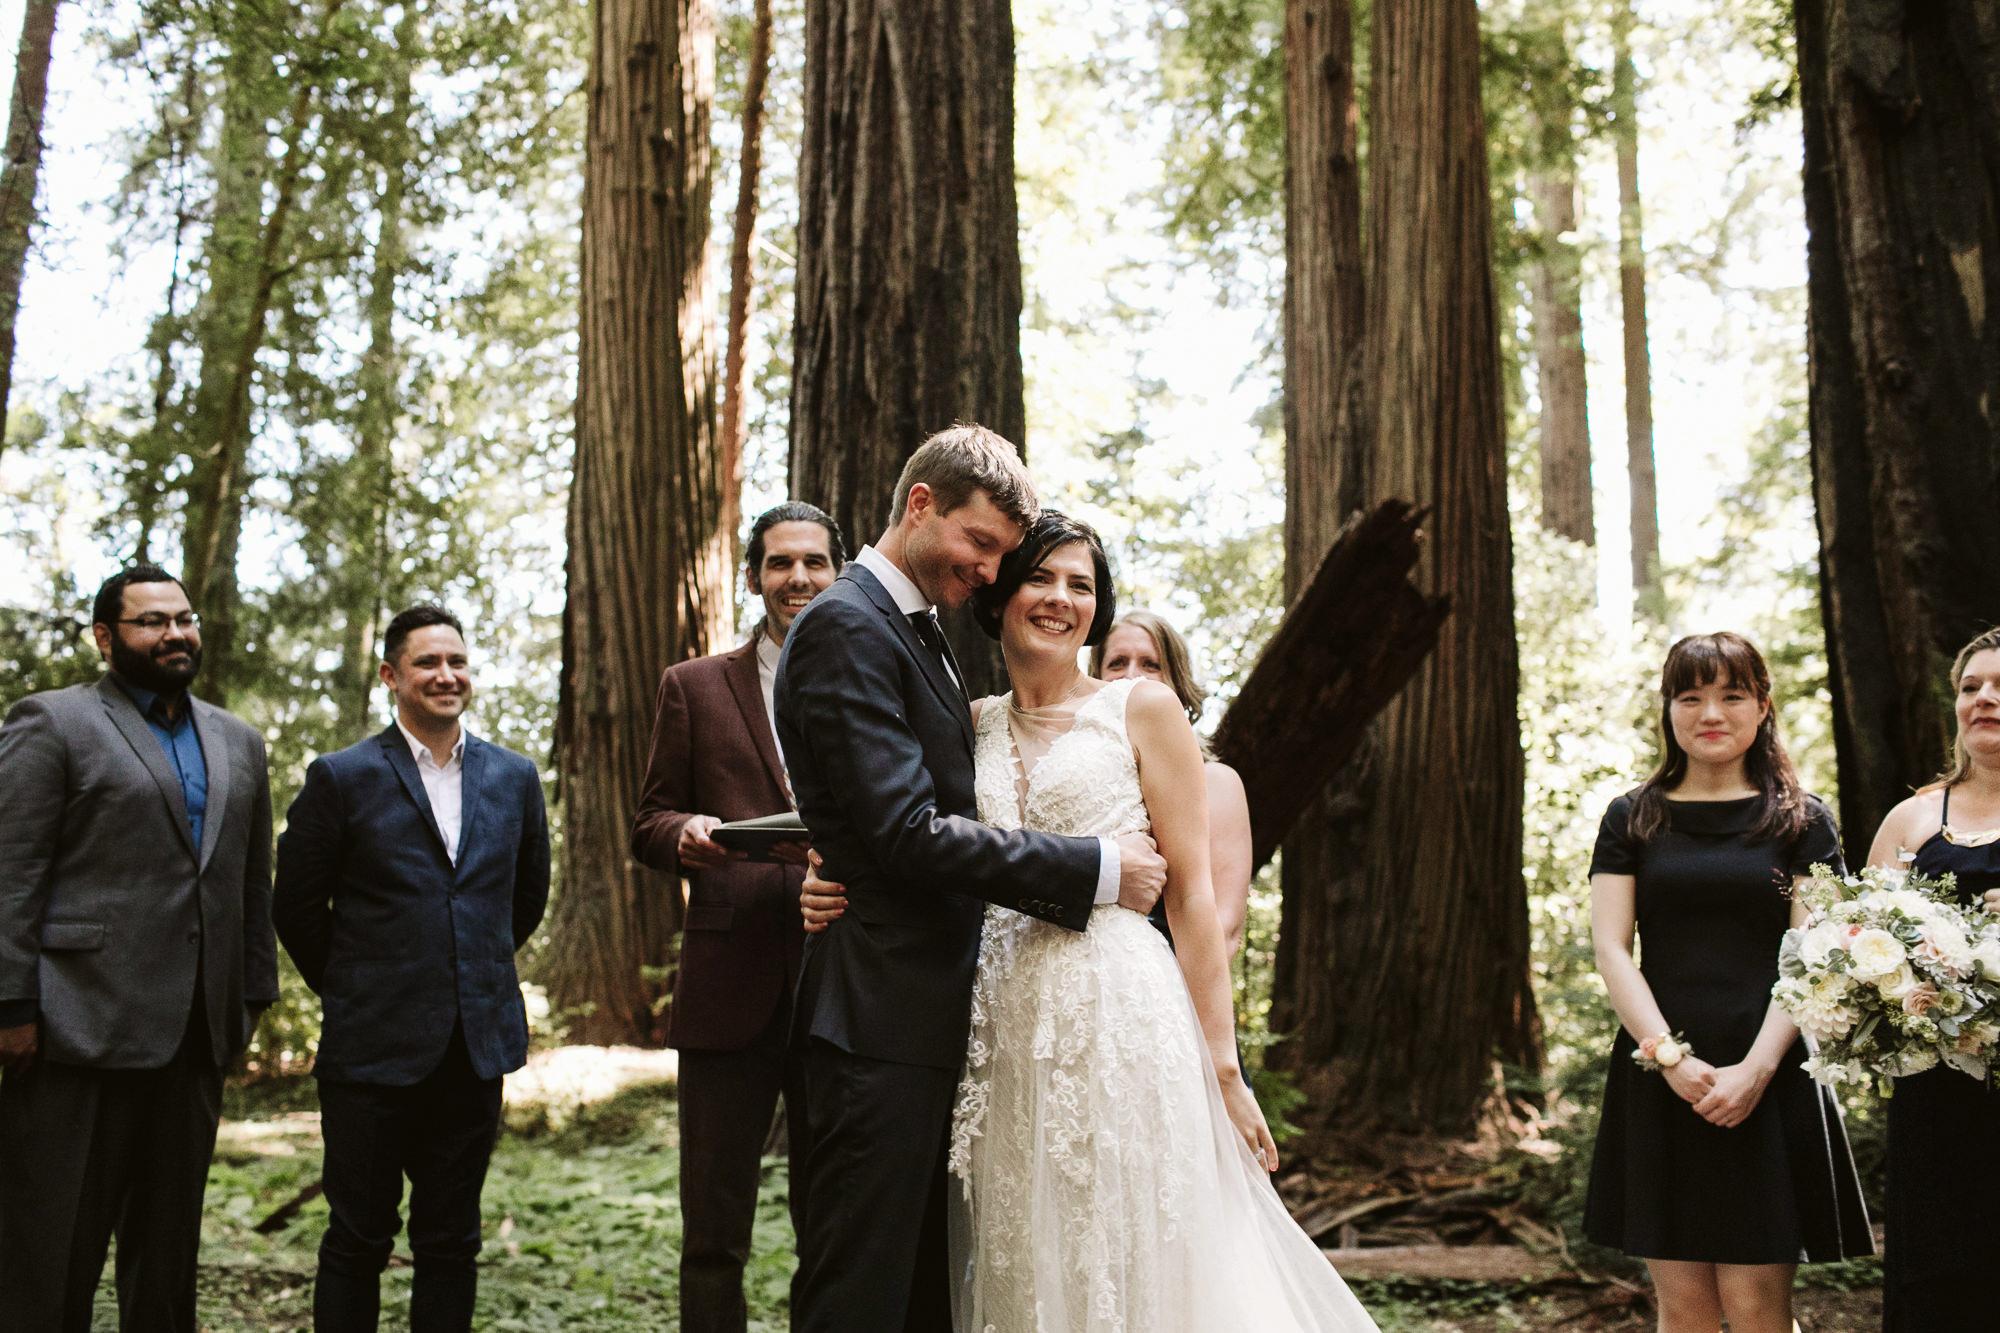 California-wedding-photographer-alfonso-flores-pamplin-groove-209.jpg